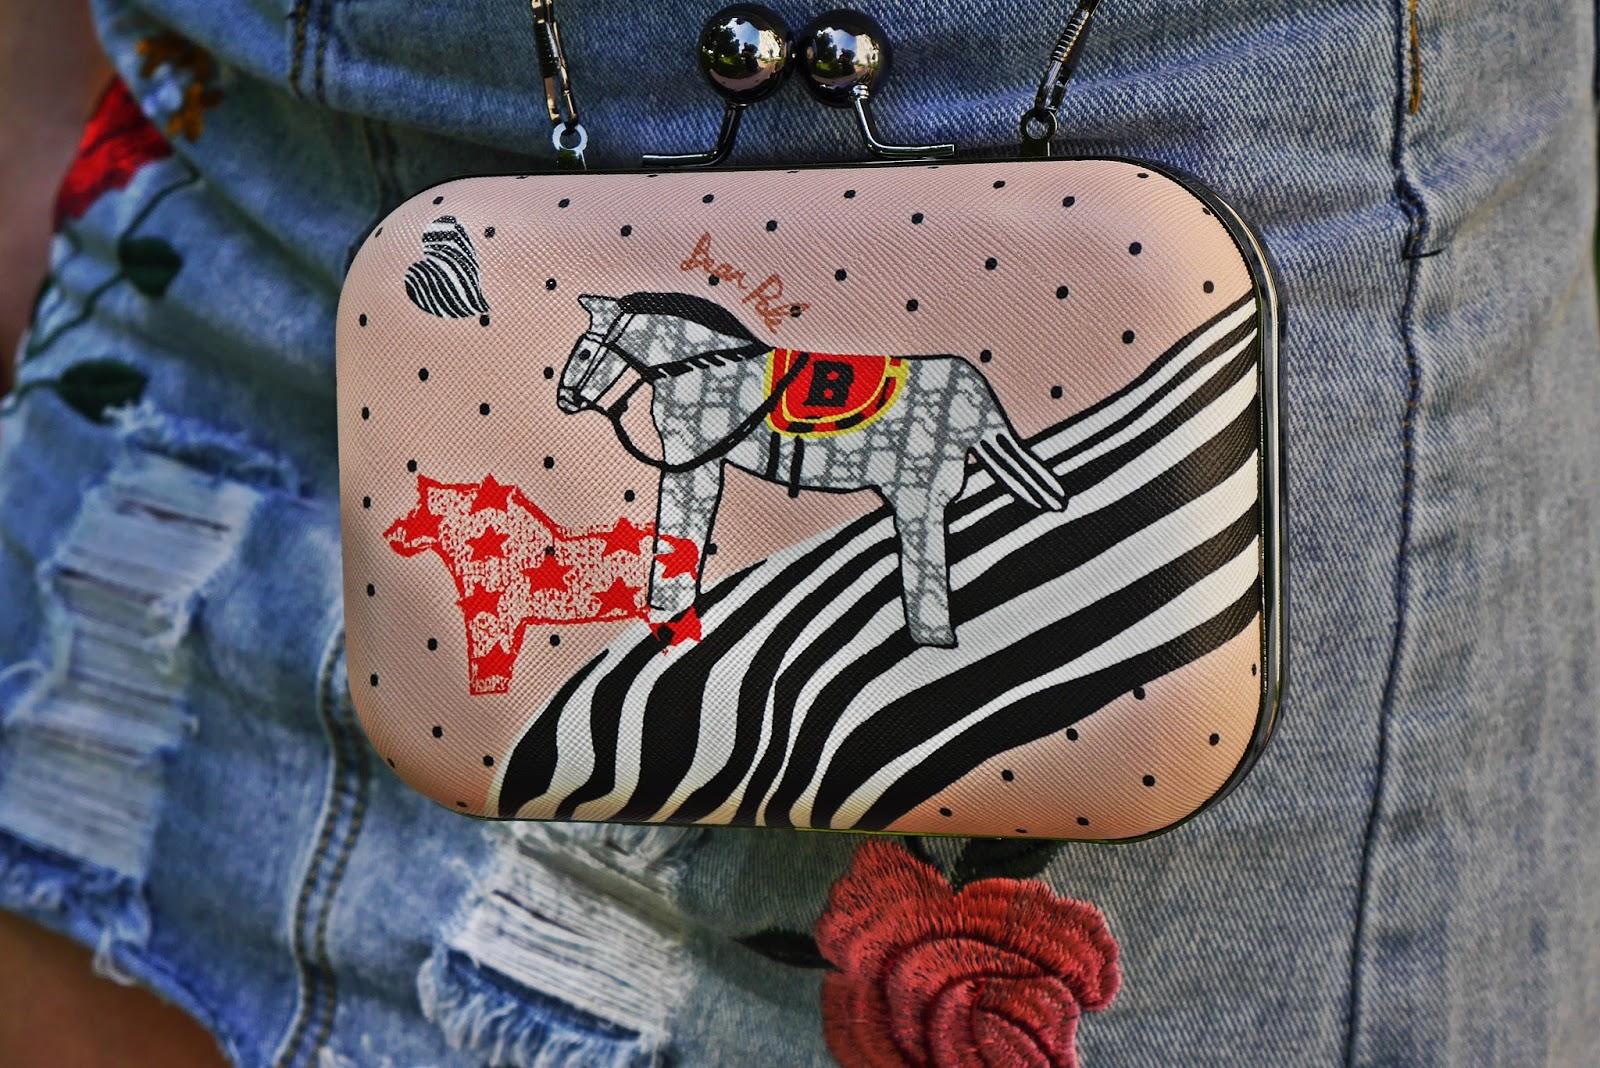 puzderko_z_rysunkiem_dresslily_bag_horse_print_050617